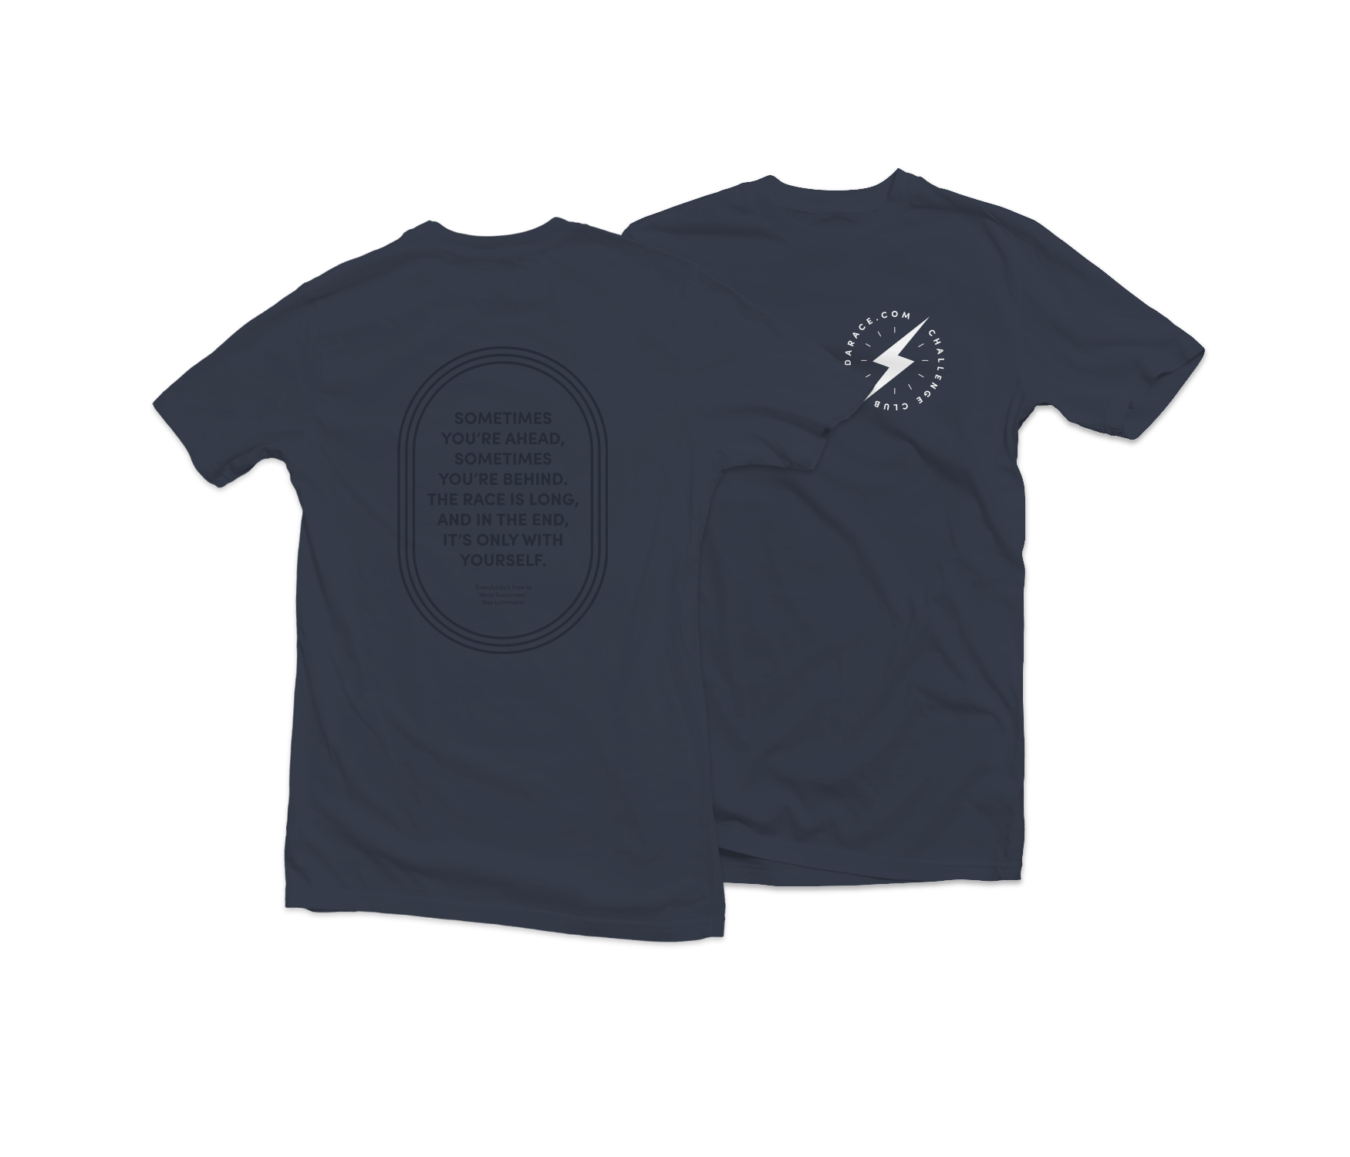 Cc3 T Shirt